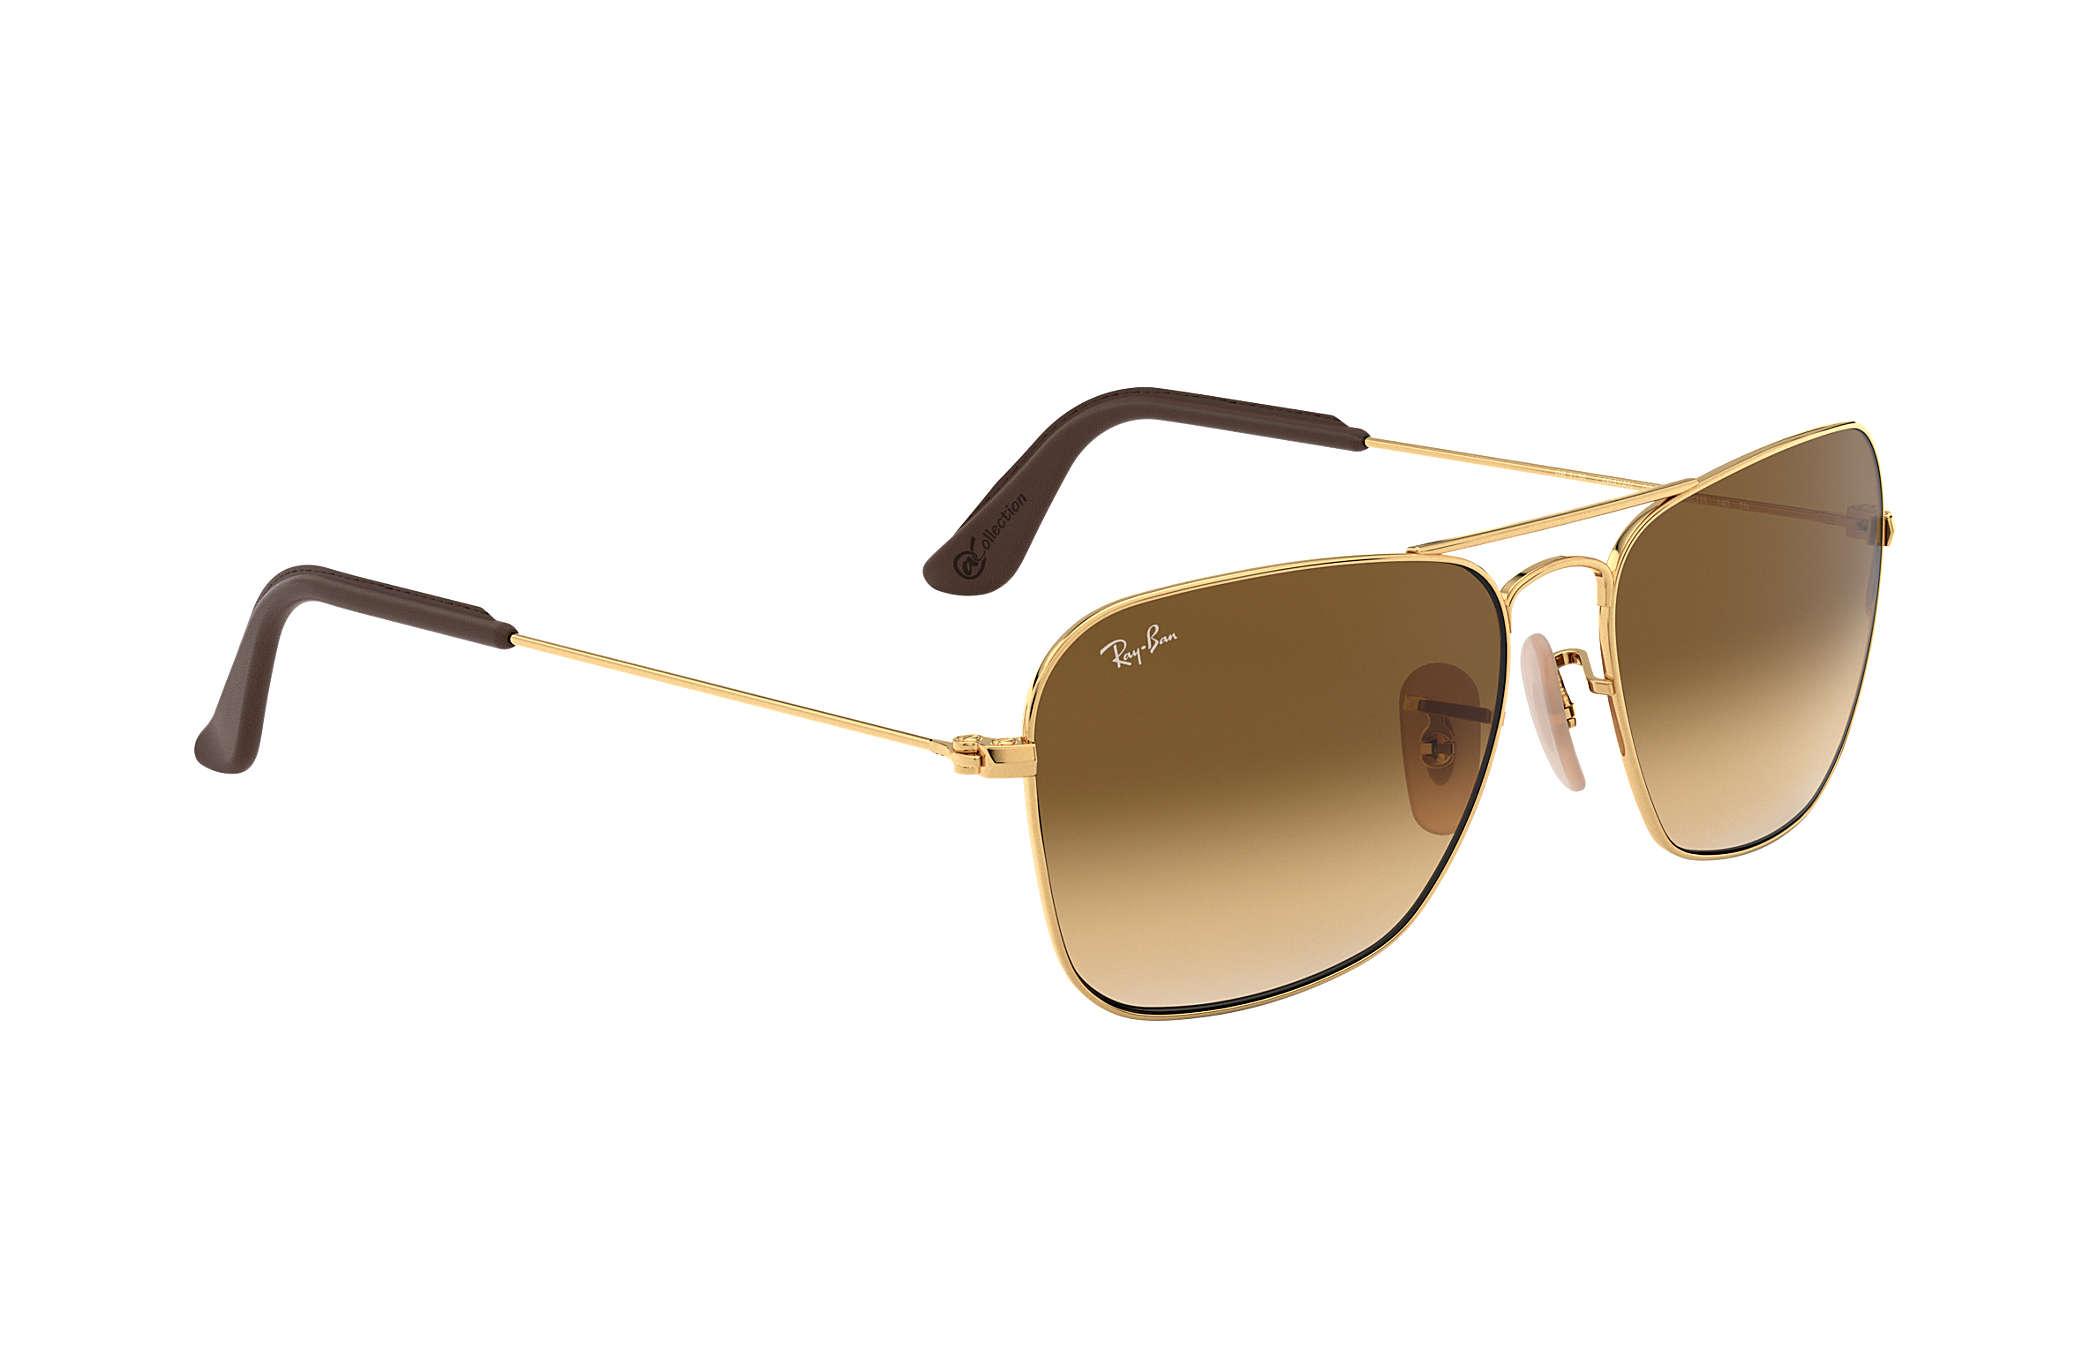 a23d575e72cf3d Ray-Ban Caravan  collection RB3136 Gold - Metal - Light Brown Lenses ...